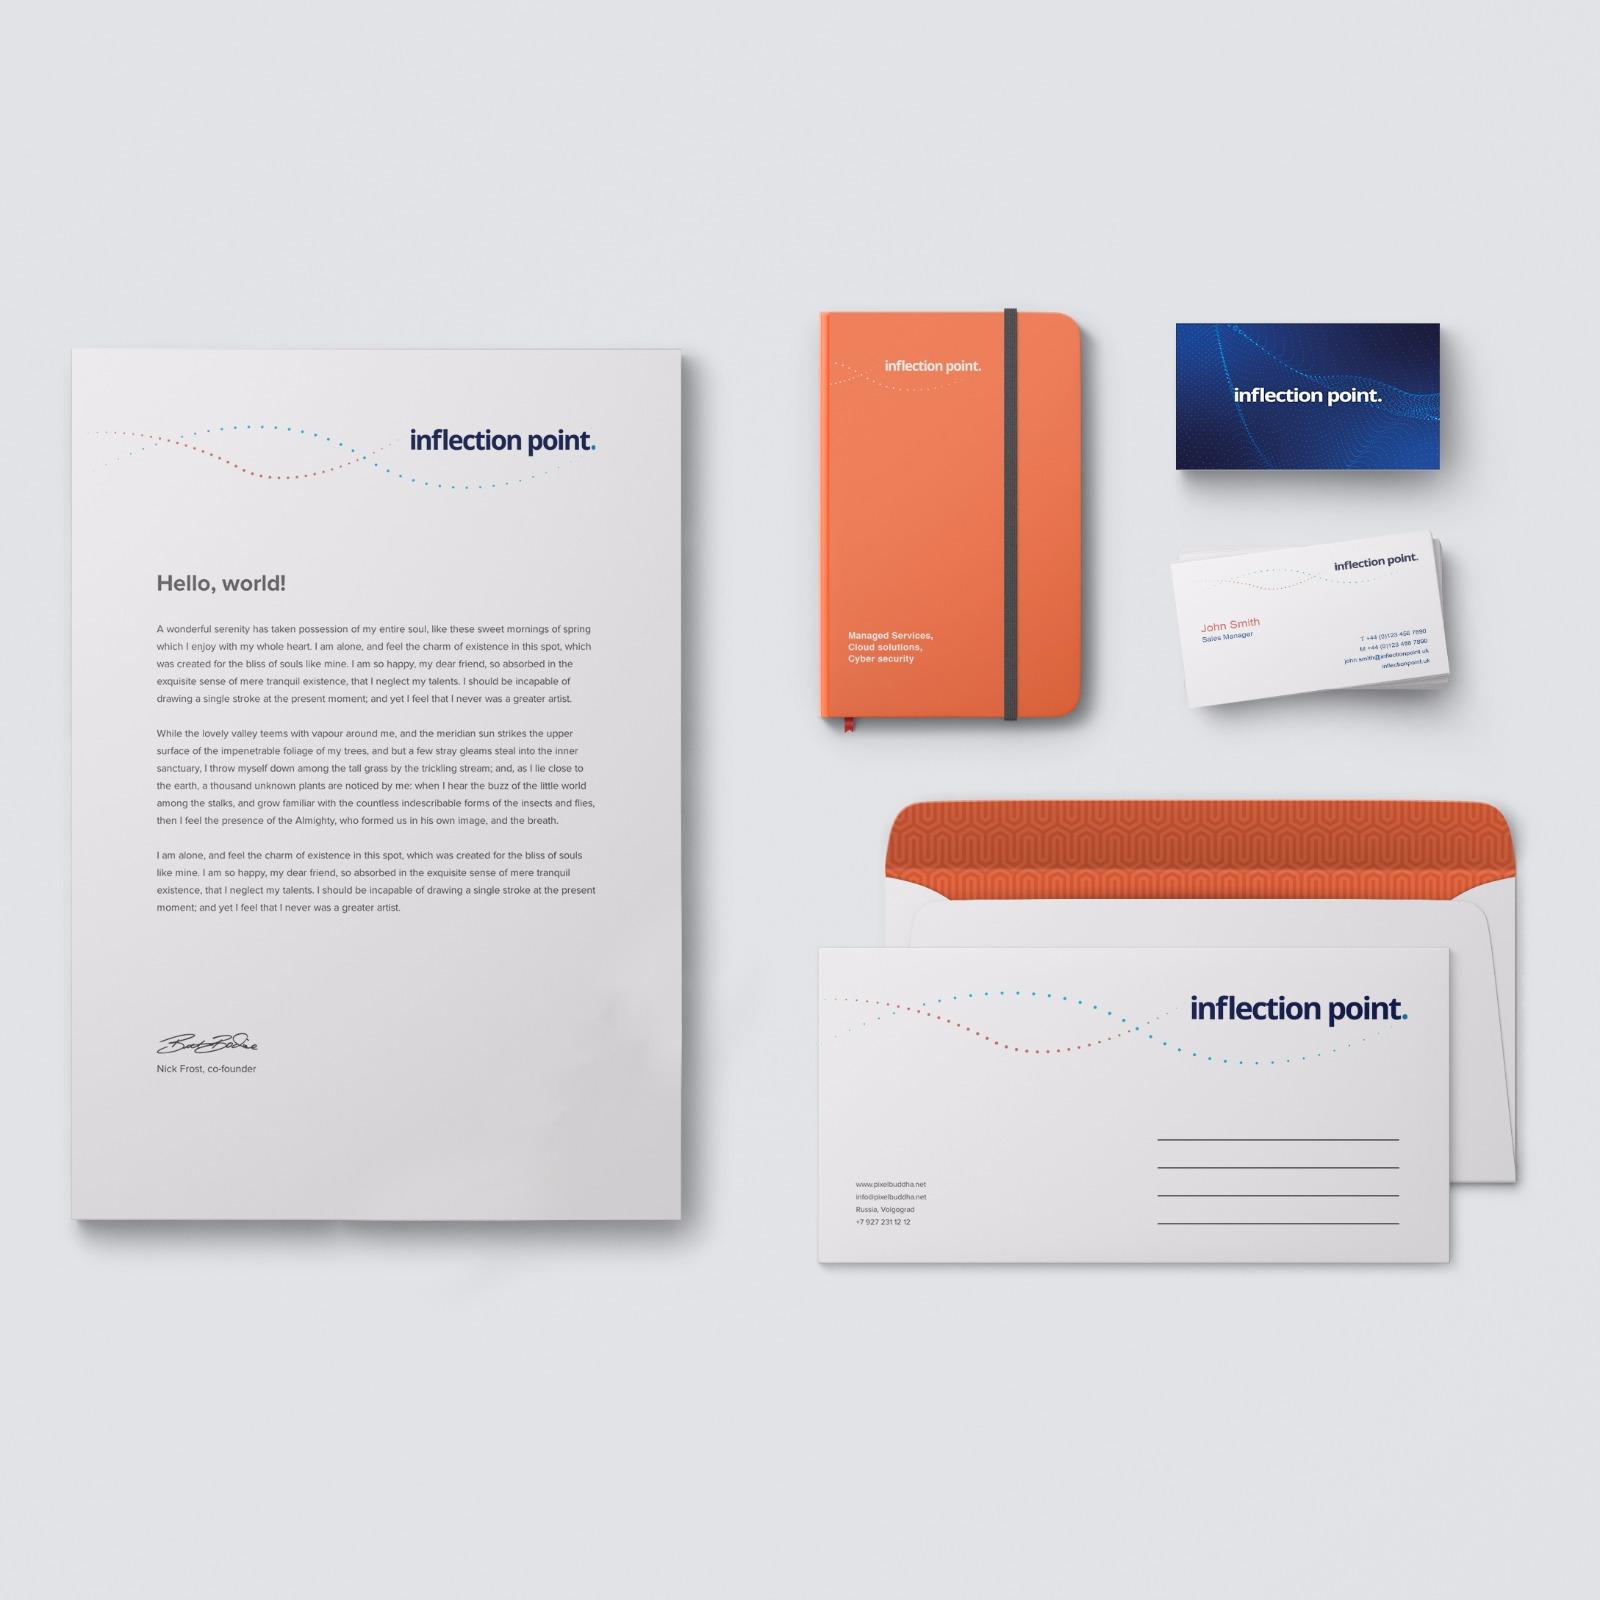 Company rebrand, image of portfolio